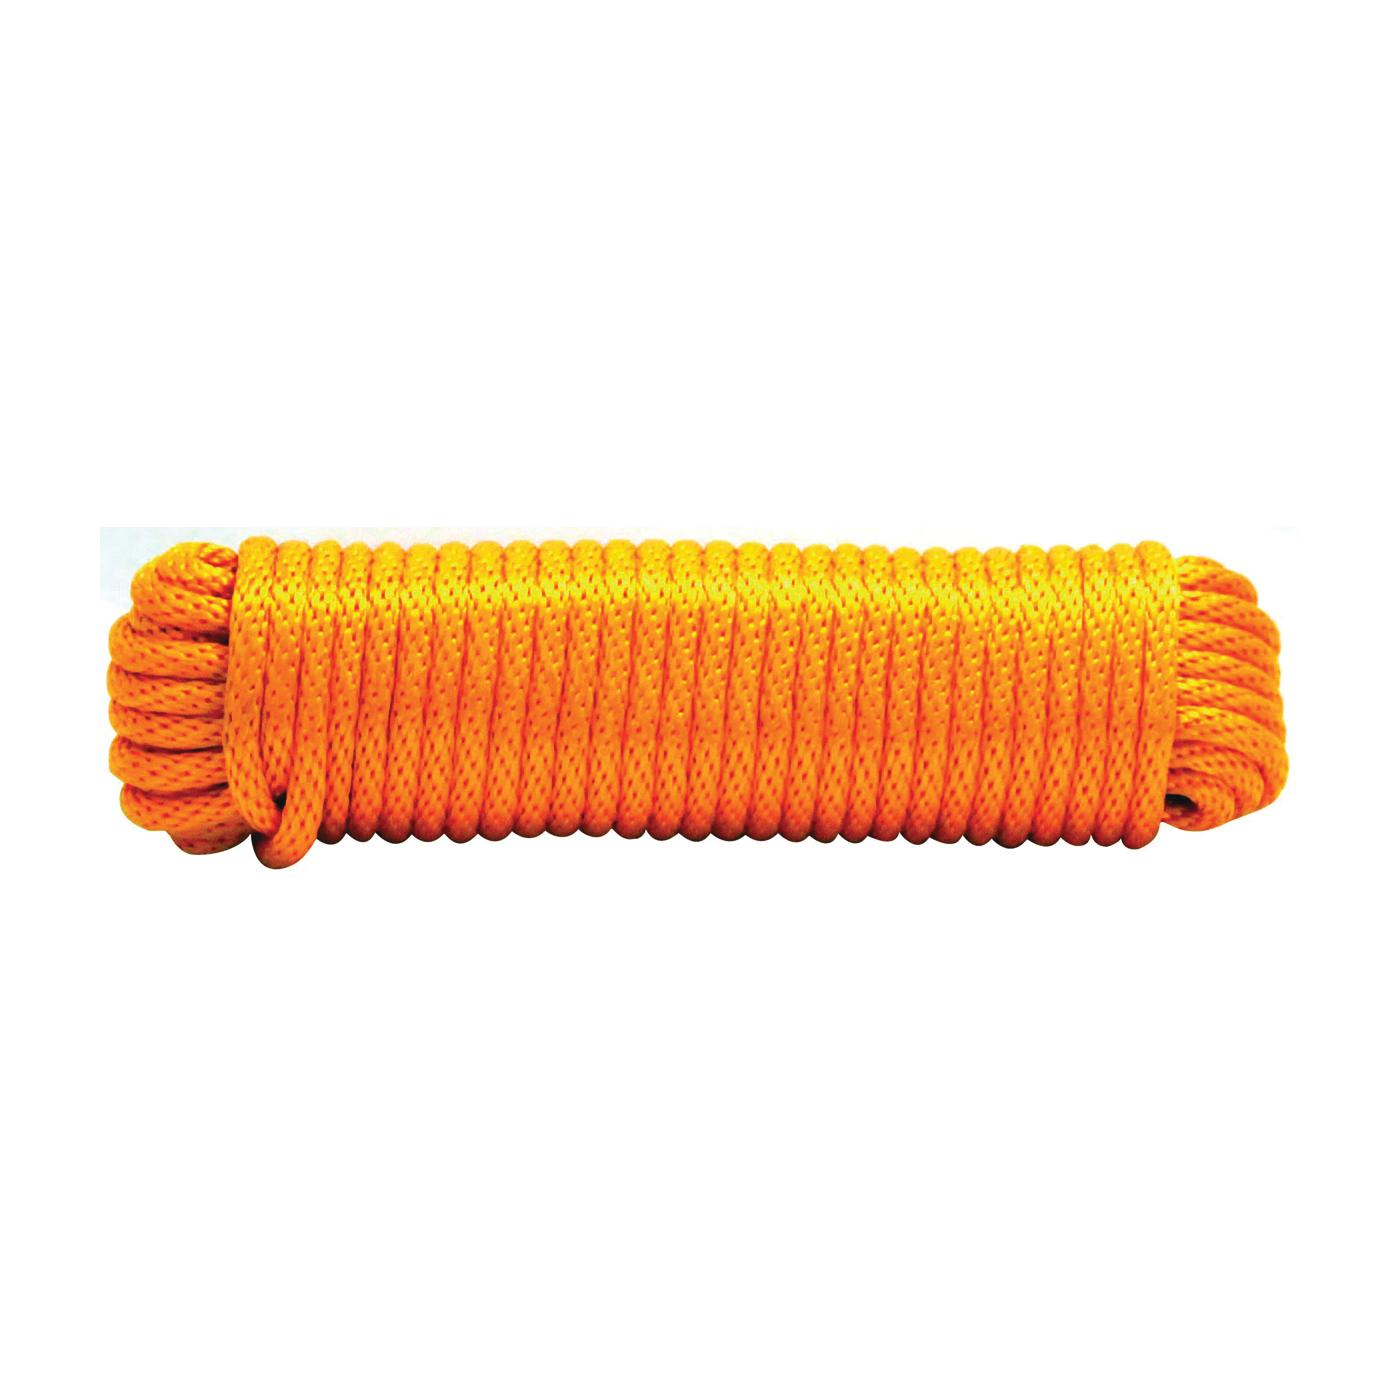 Picture of SecureLine MFP1675-2P Rope, 1/2 in Dia, 75 ft L, Polypropylene, Orange, Hank